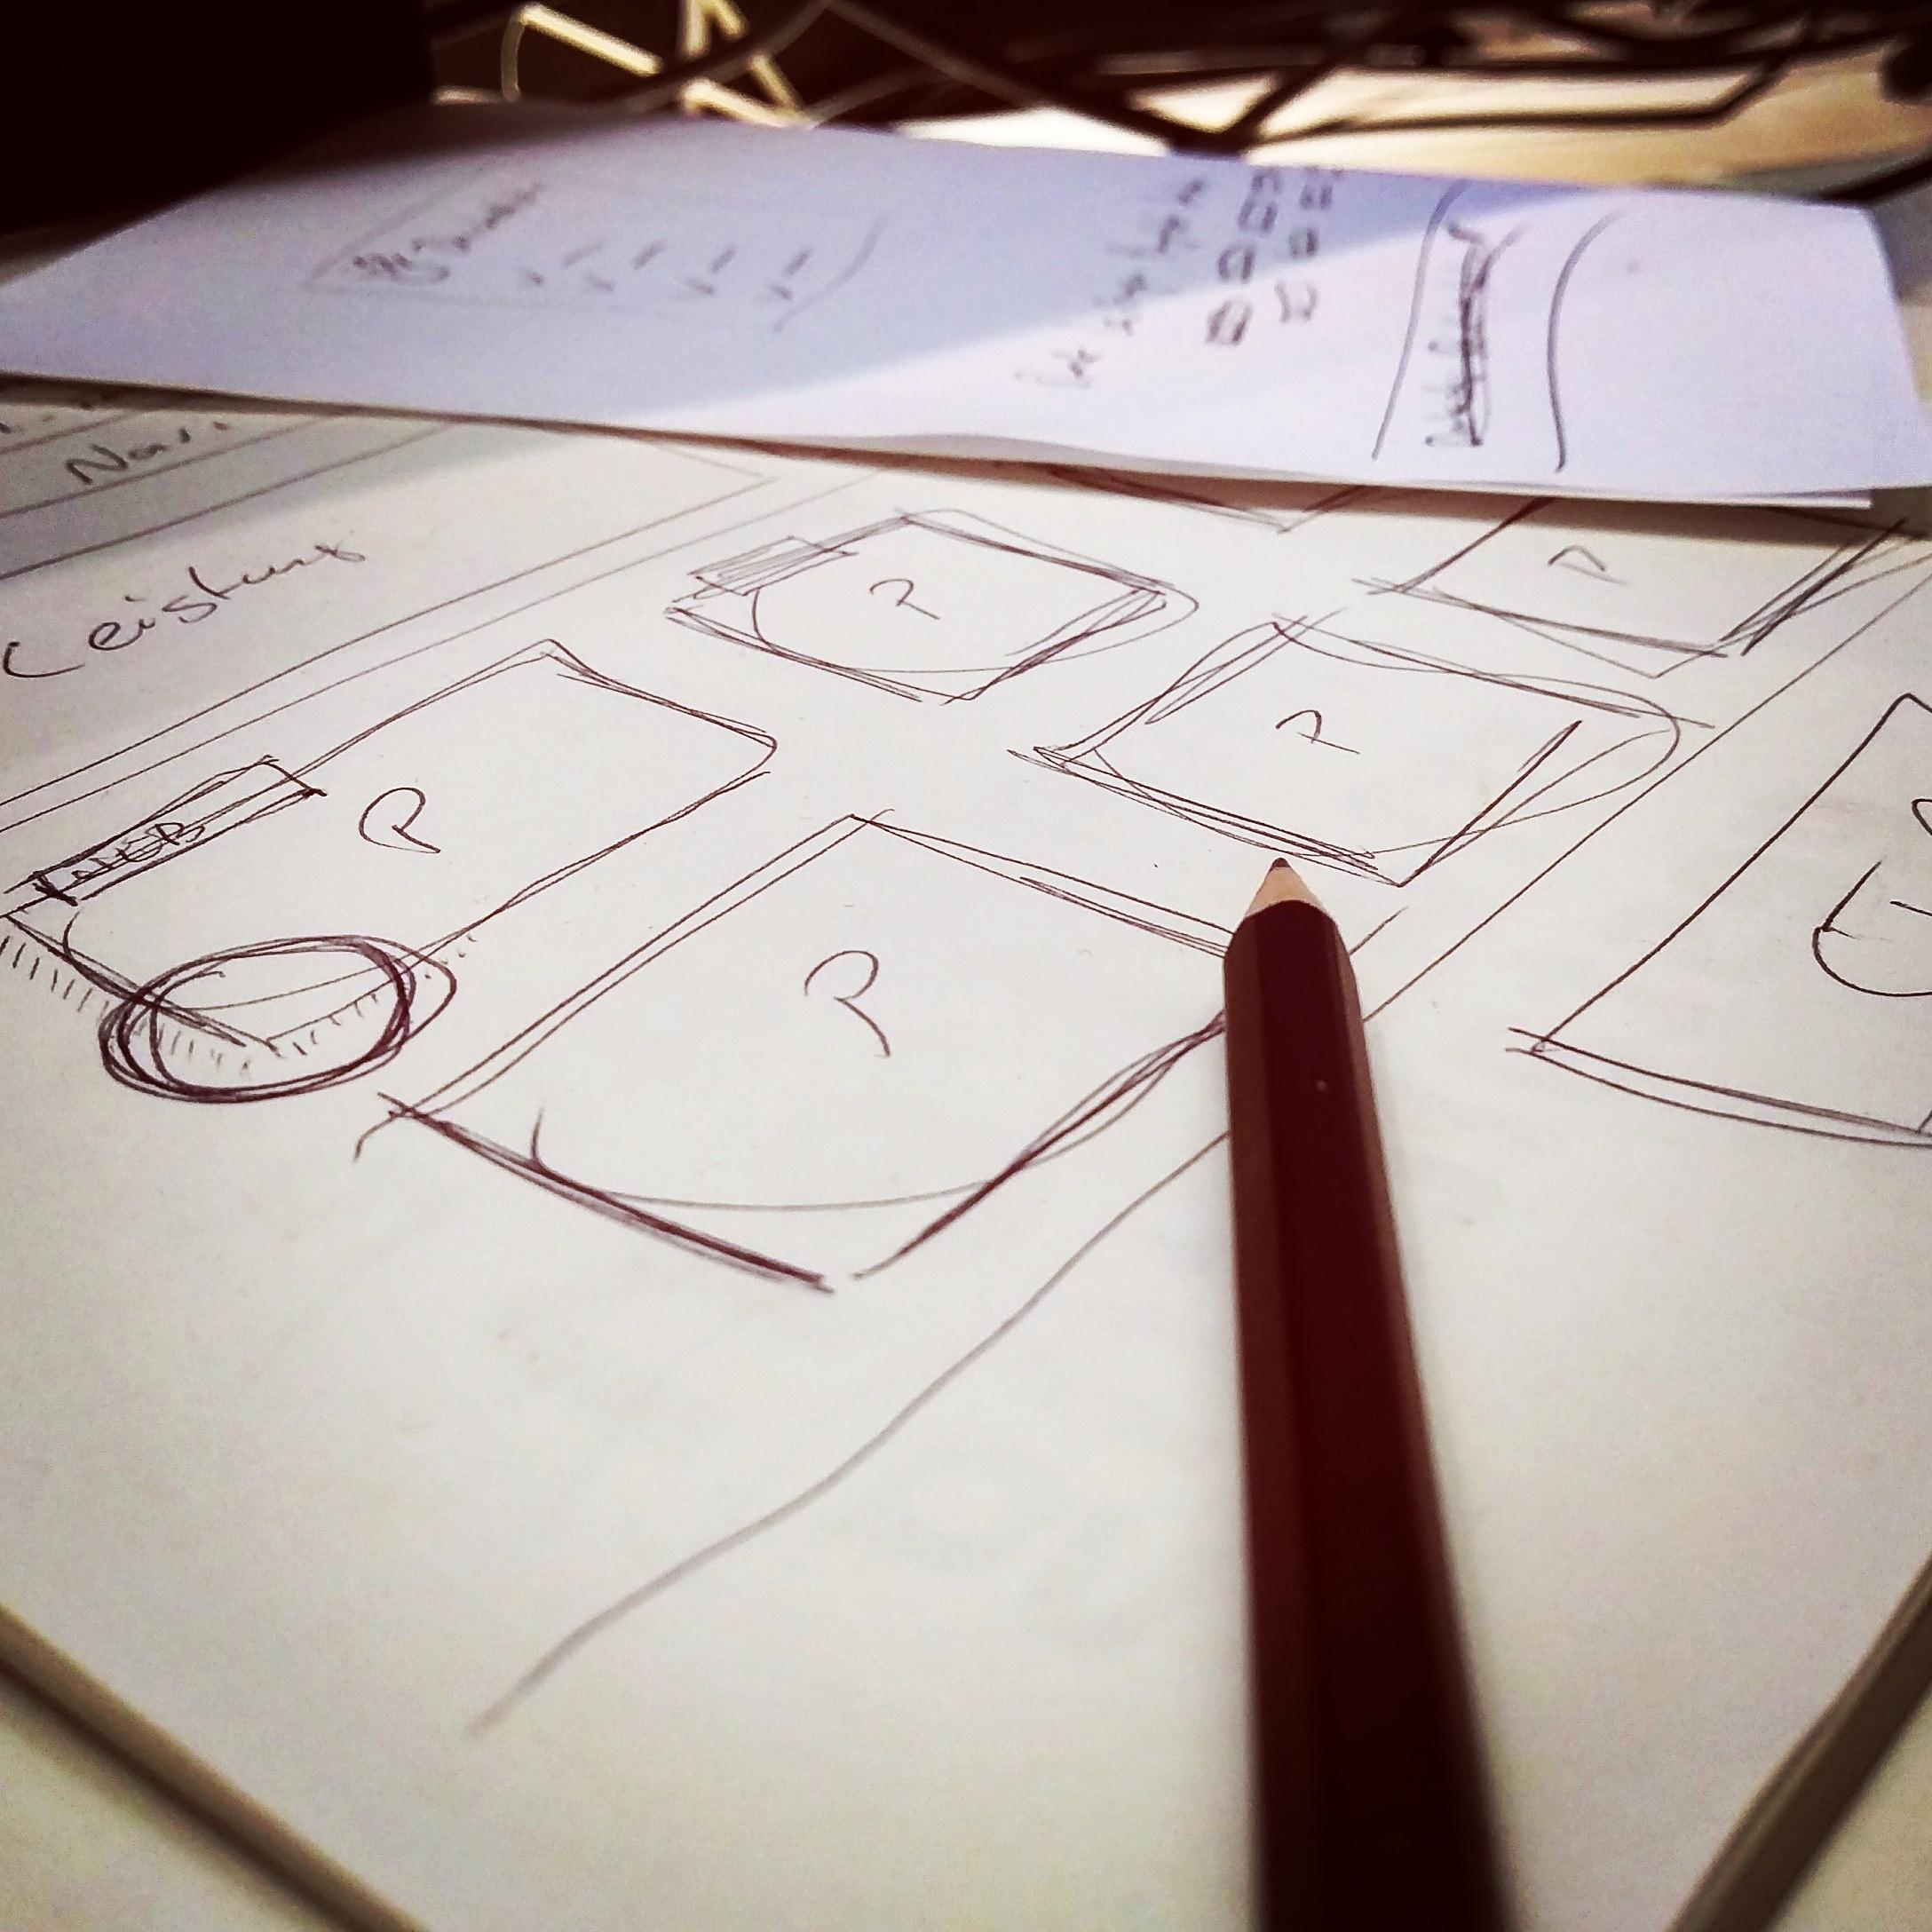 Gambar Penulisan Pensil Kreatif Daun Pena Analog Notepad